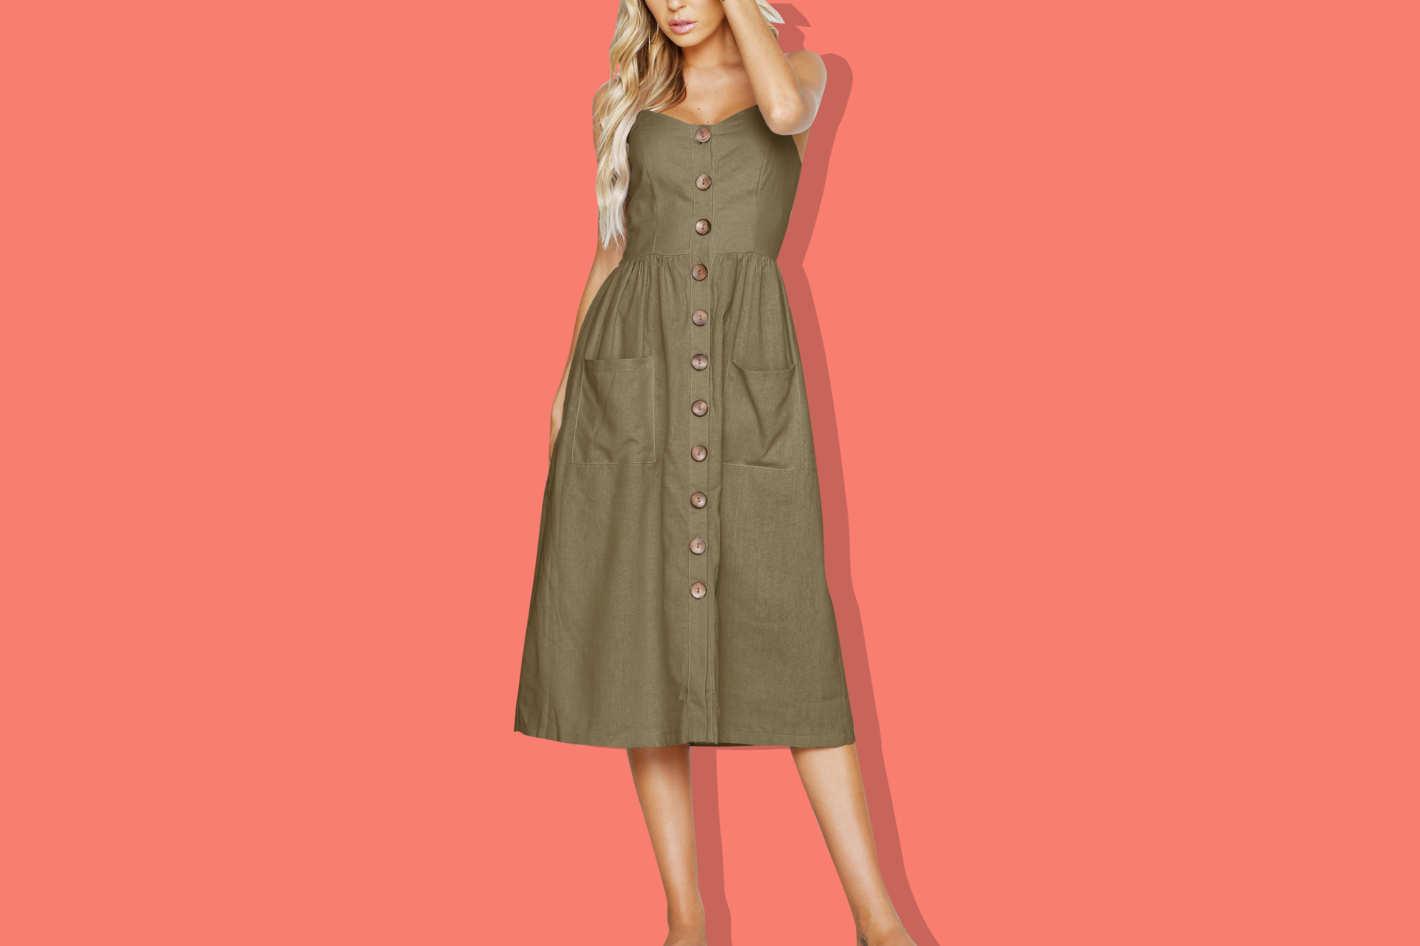 Venidress Striped Single-Breasted Mid Calf Dress